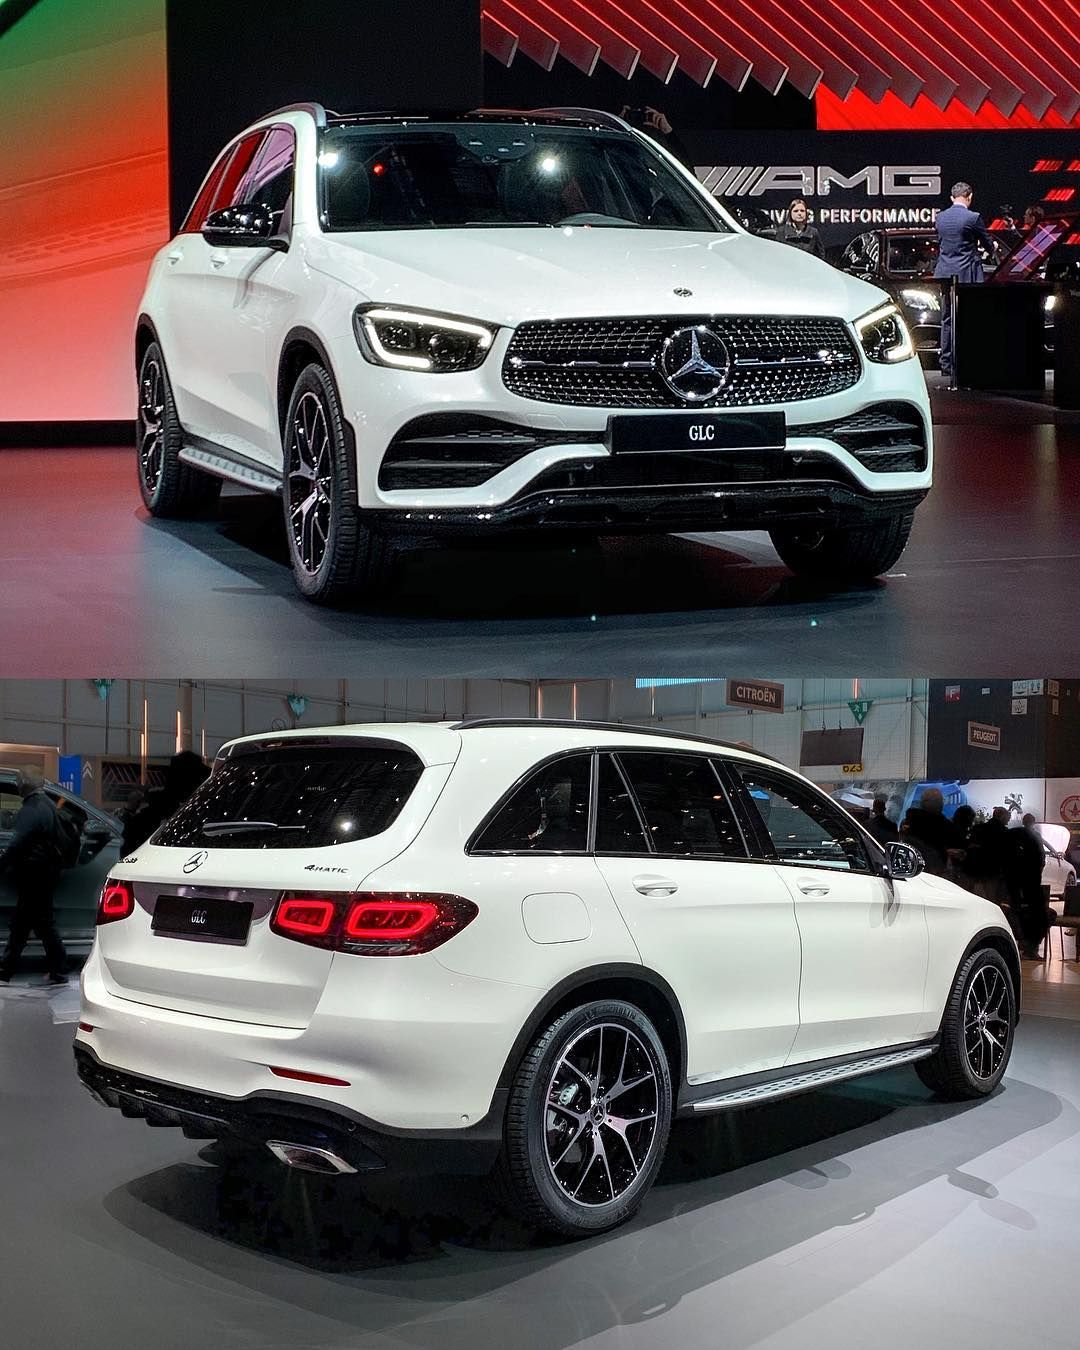 2019 Mercedes-AMG GLC Class | vision board | Mercedes benz suv